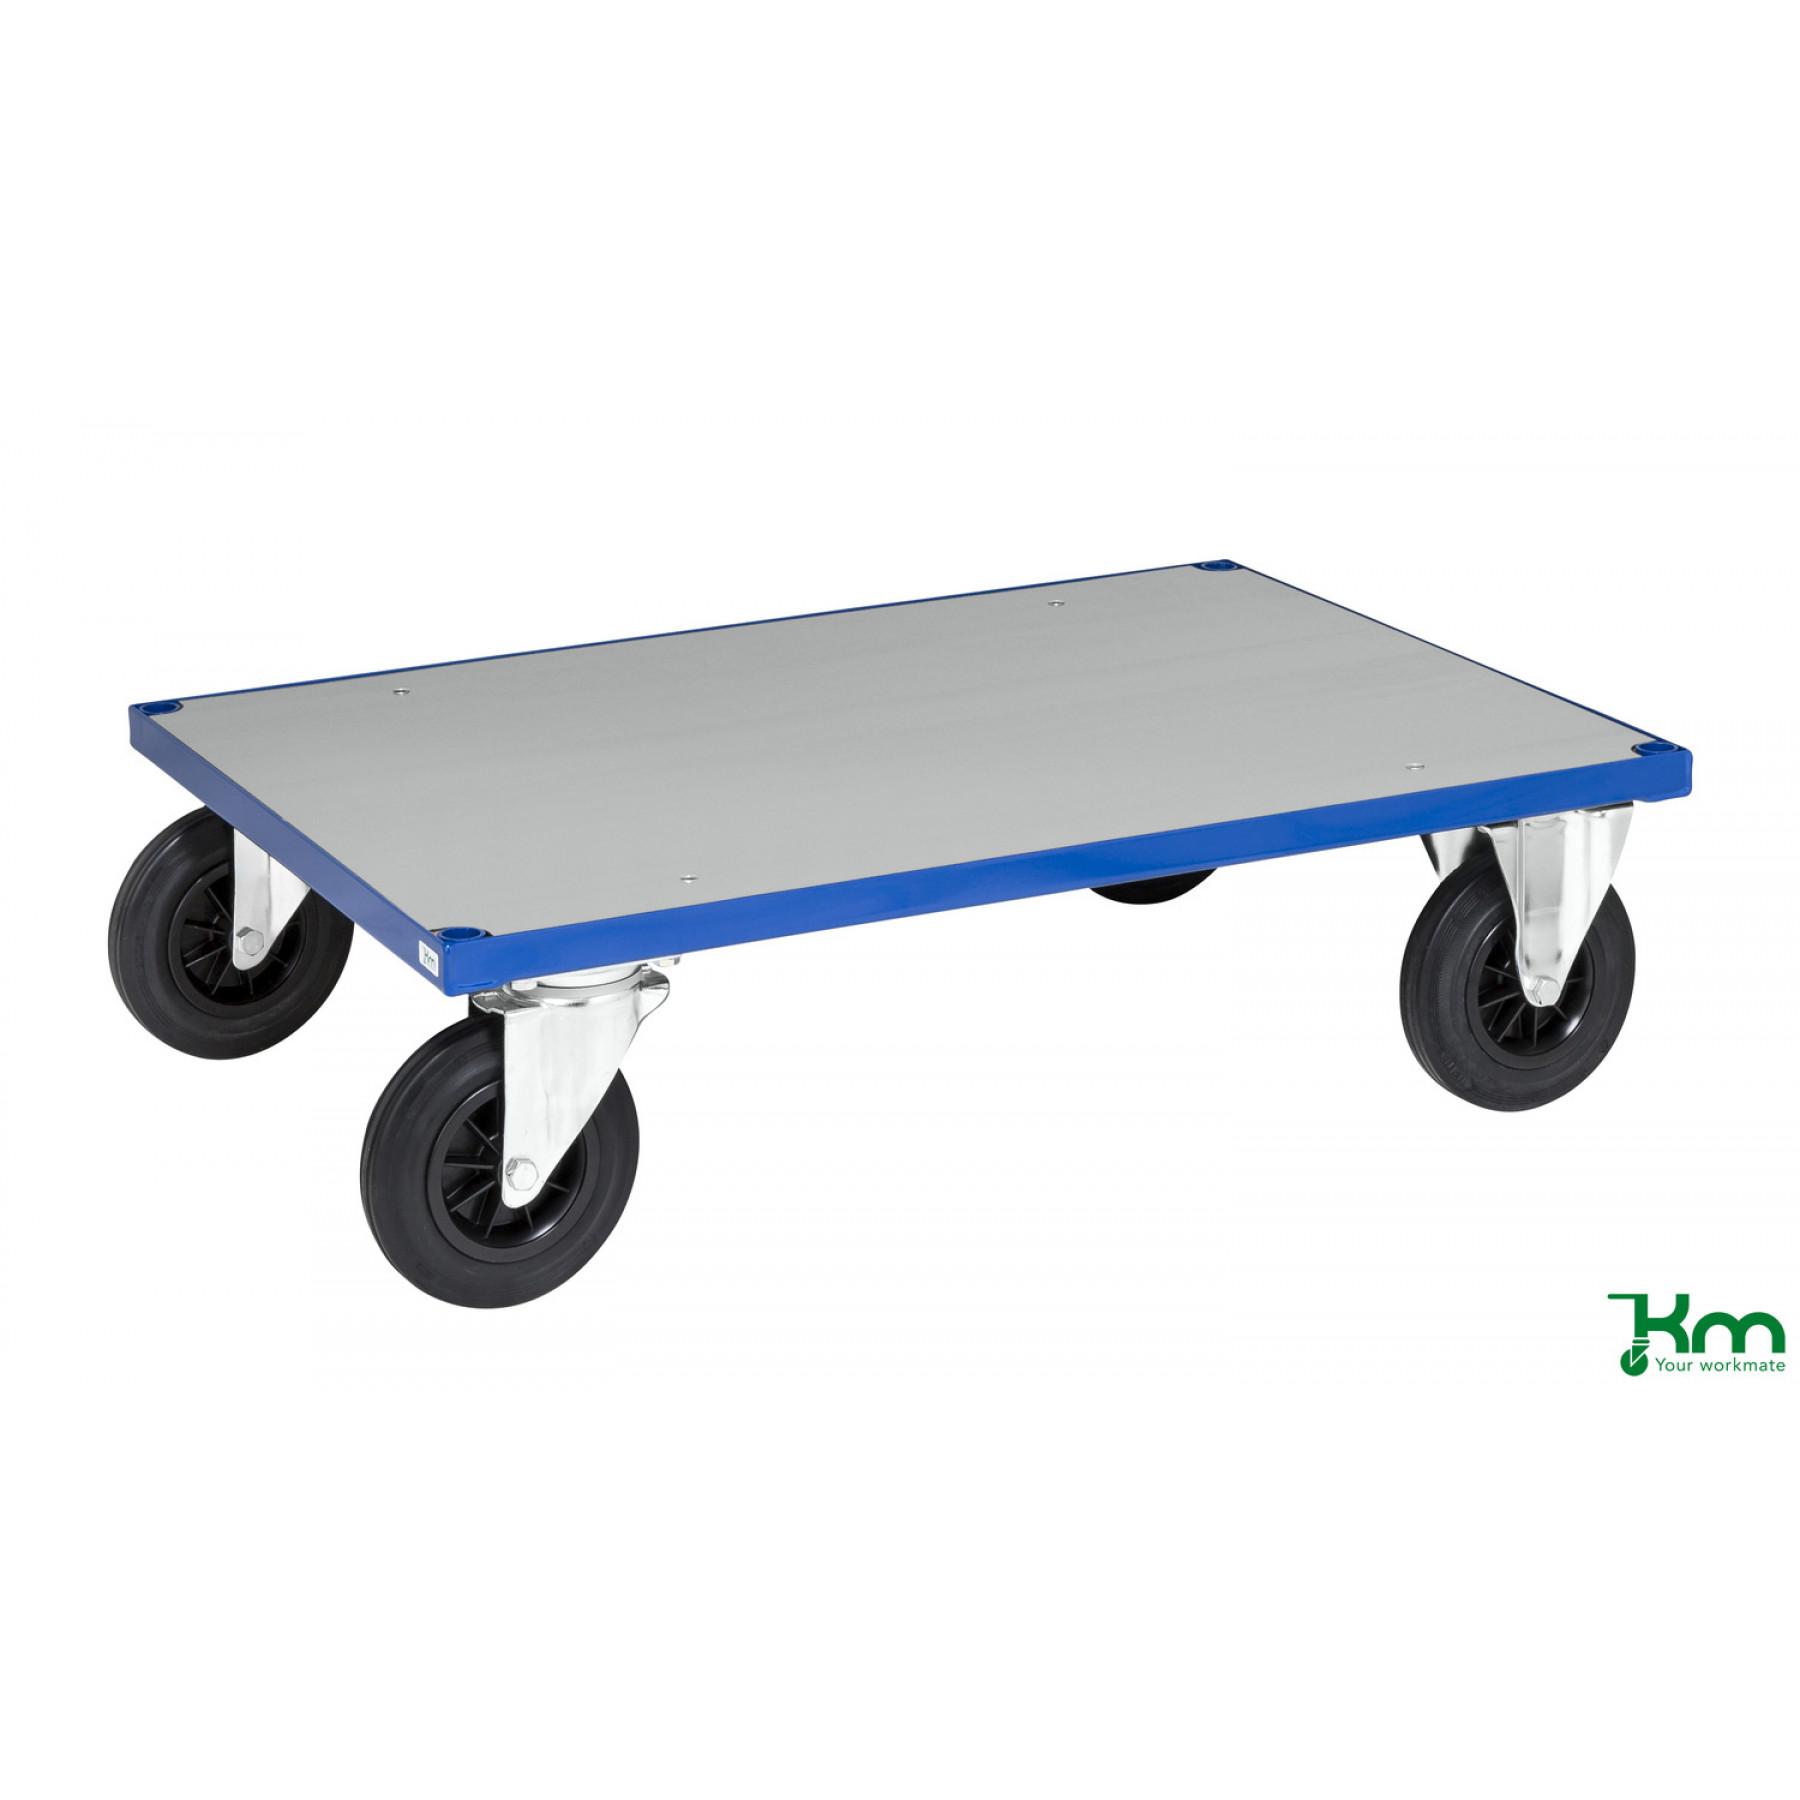 Platformwagen 1200x800 mm, KM 430-3B